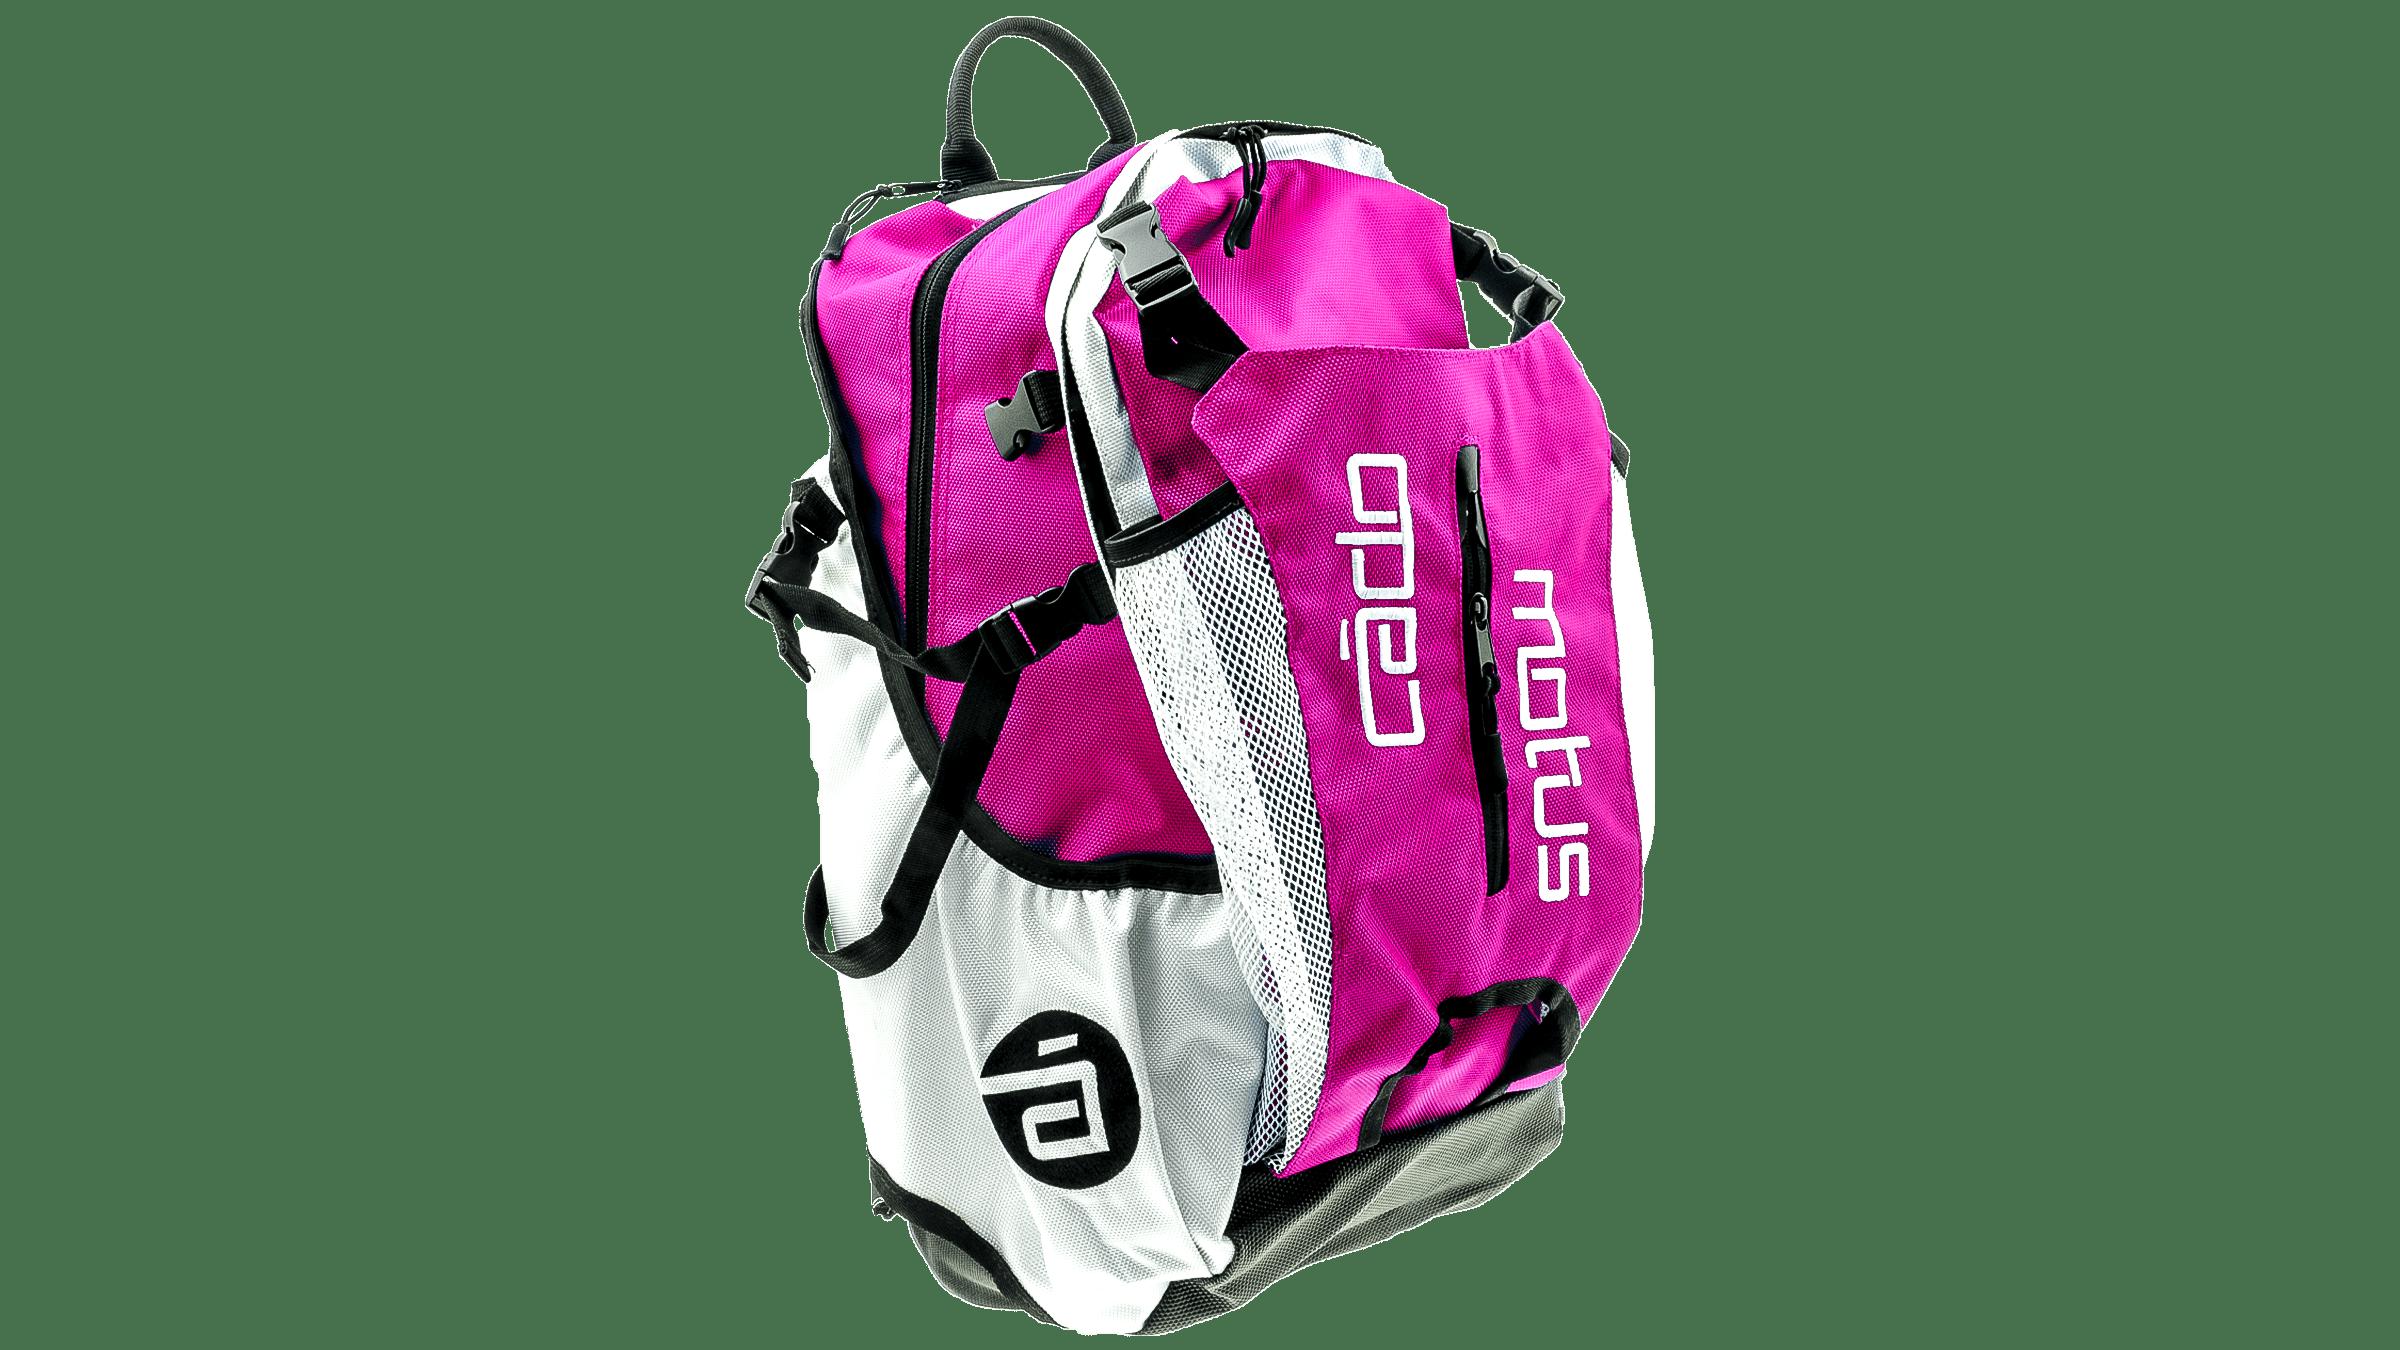 8afa8798441 CadoMotus Airflow gear skate skeeler bag - pink/white bestellen bij ...